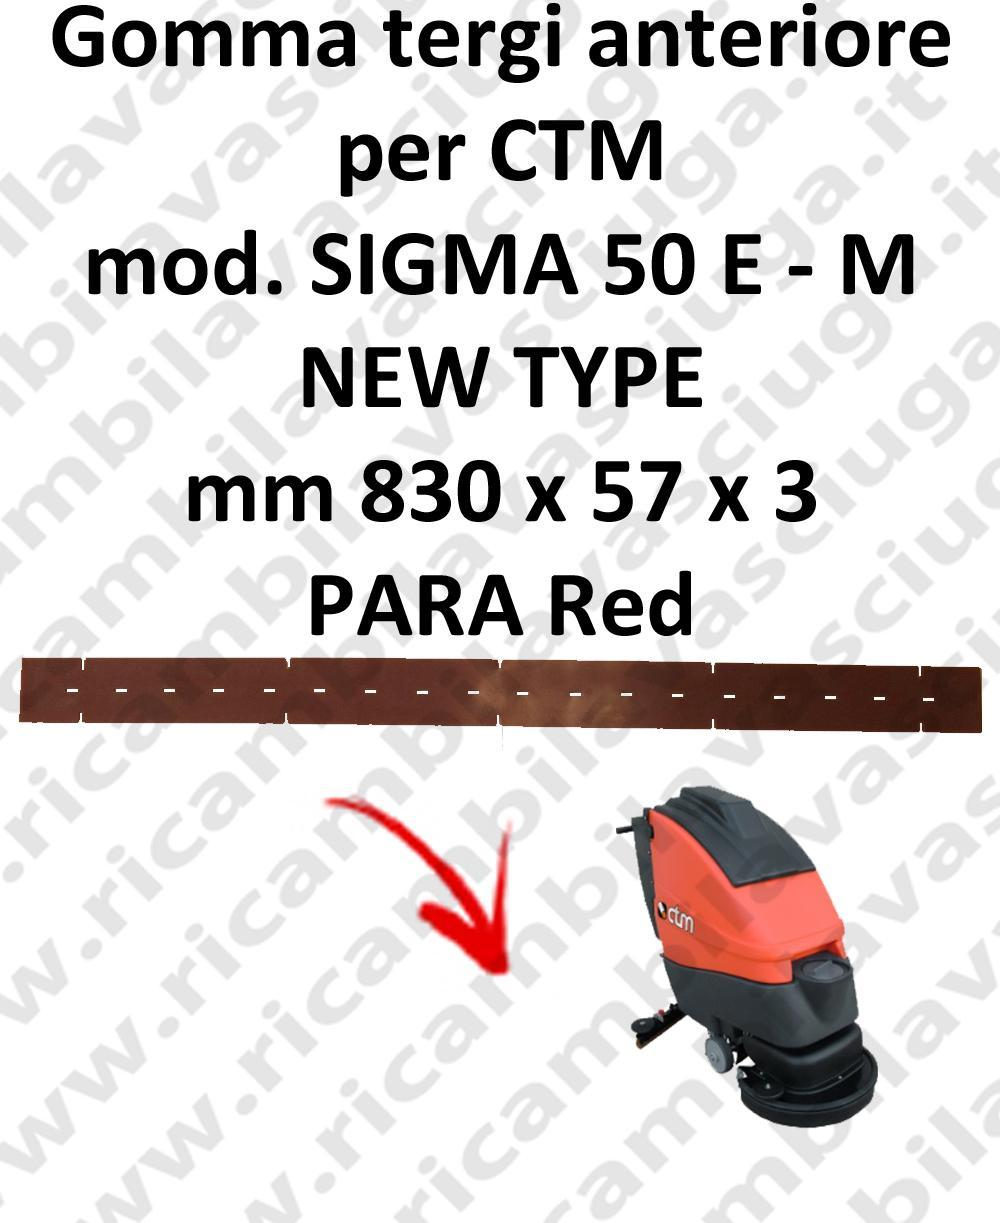 SIGMA 50 E - M new type goma de secado fregadora delantera para CTM